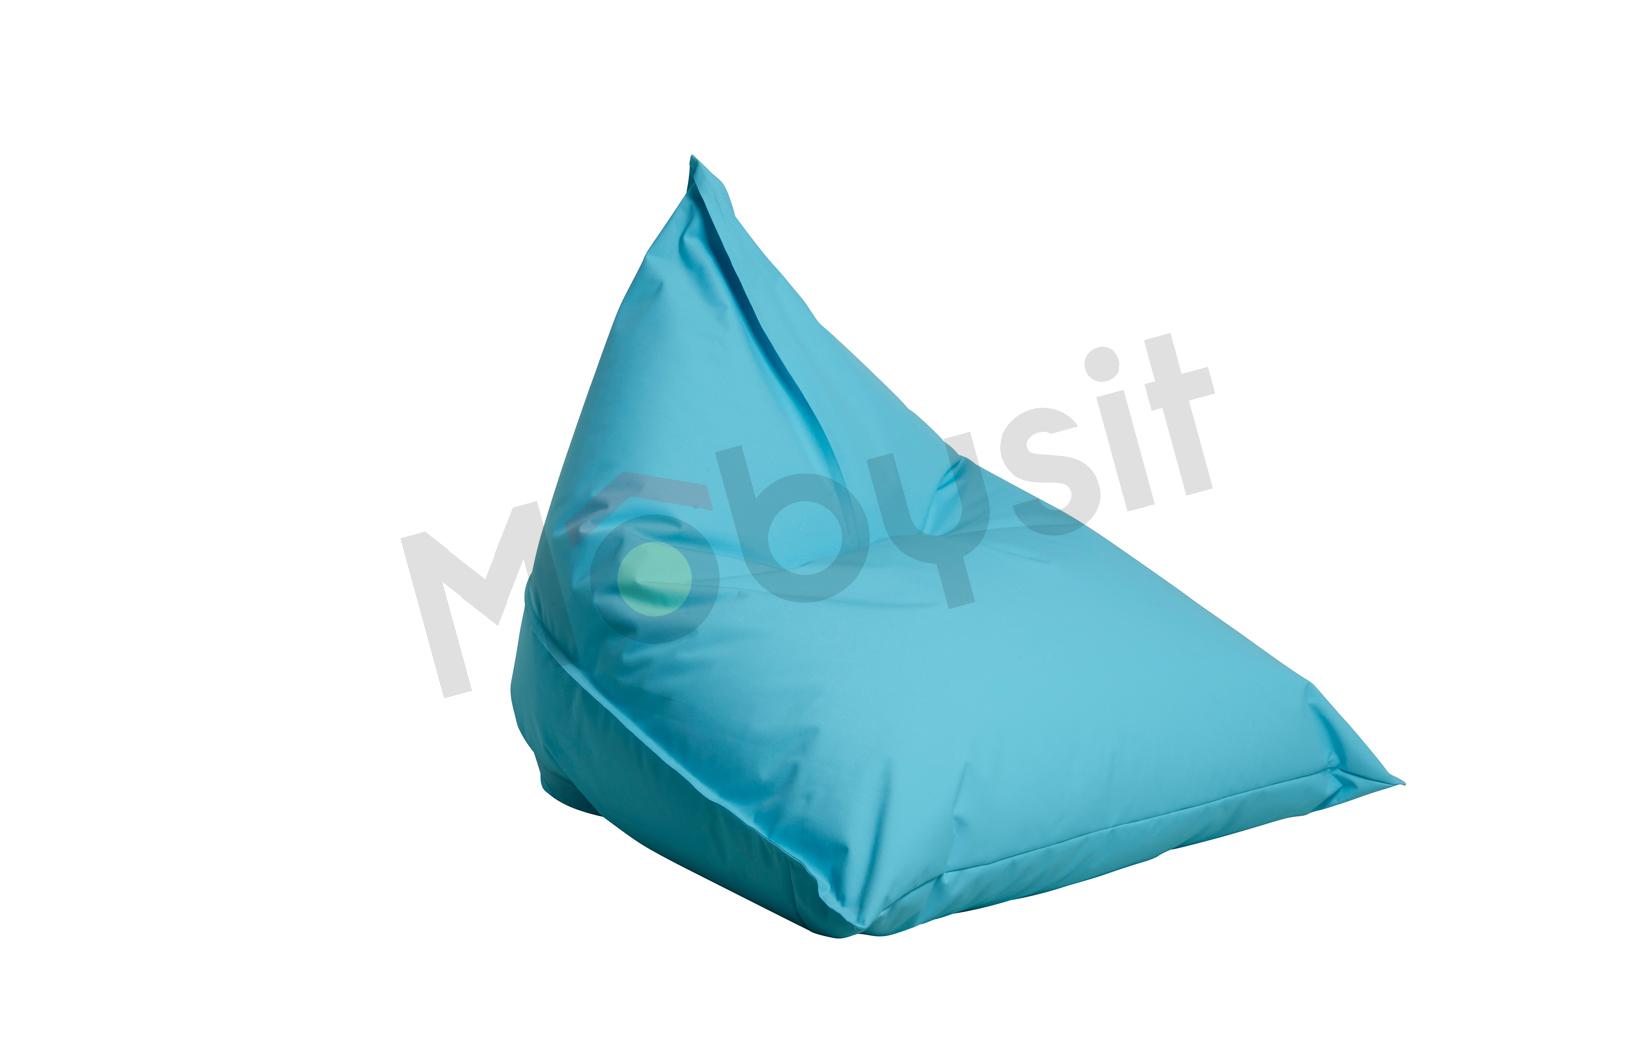 Triangle 1277014 big